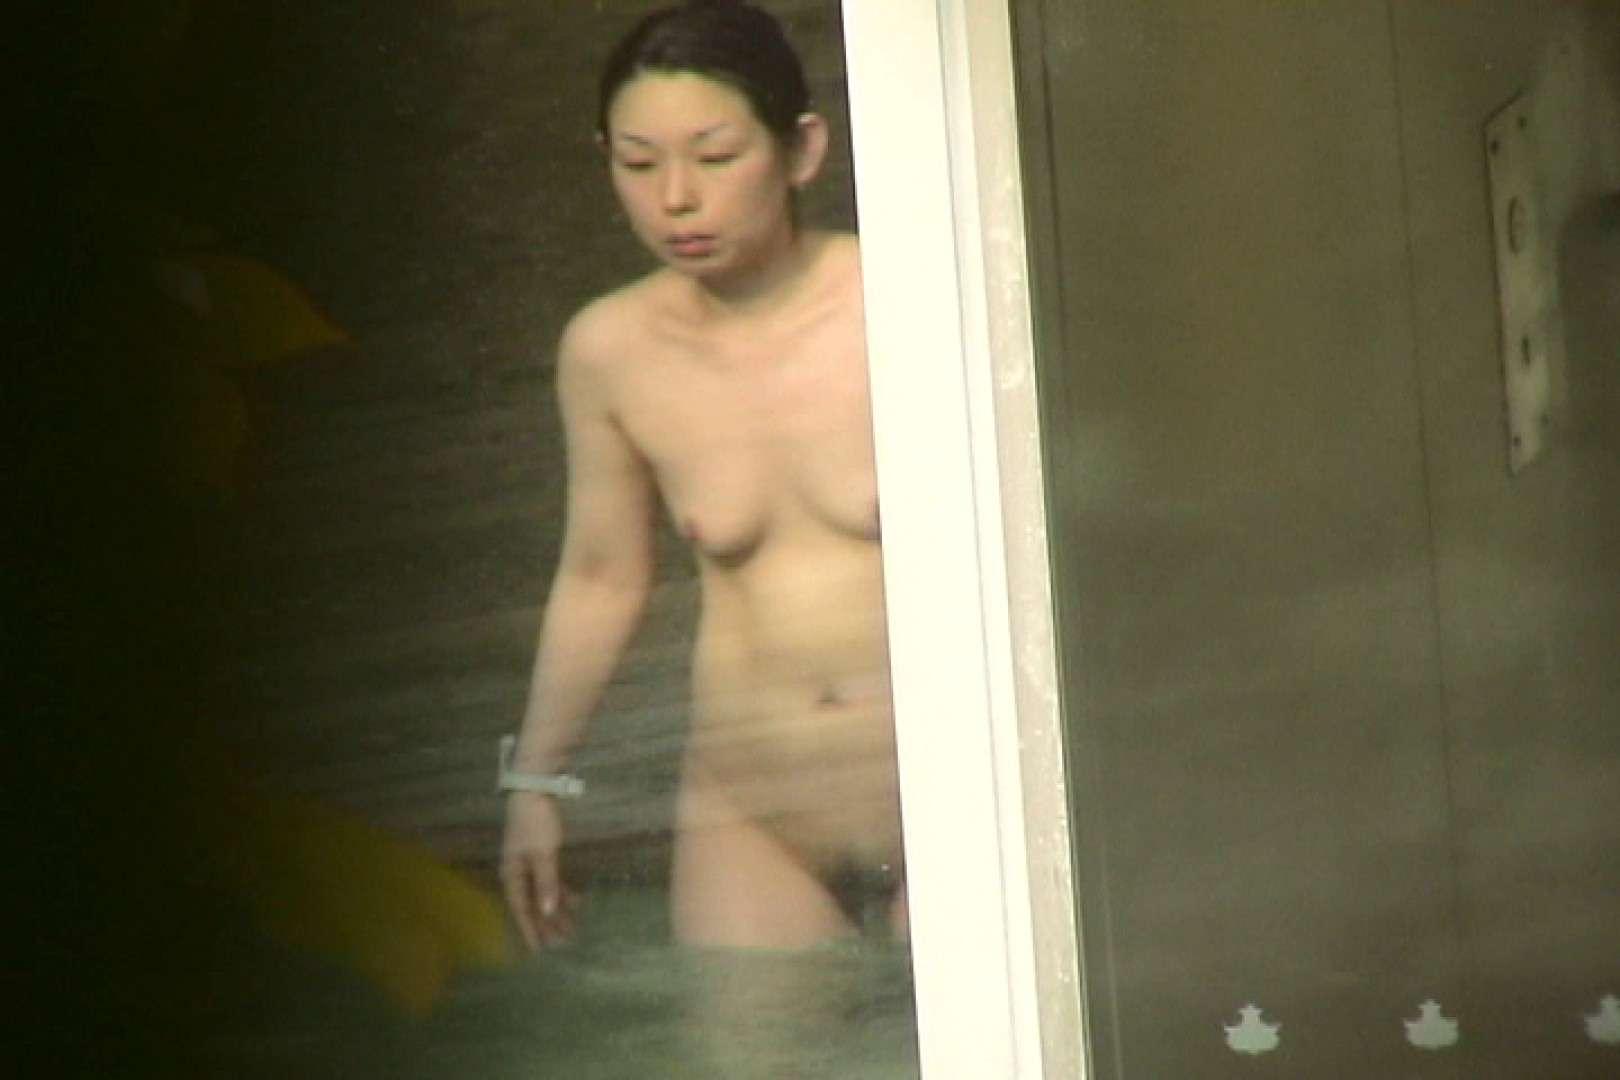 Aquaな露天風呂Vol.456 盗撮 | HなOL  102pic 12